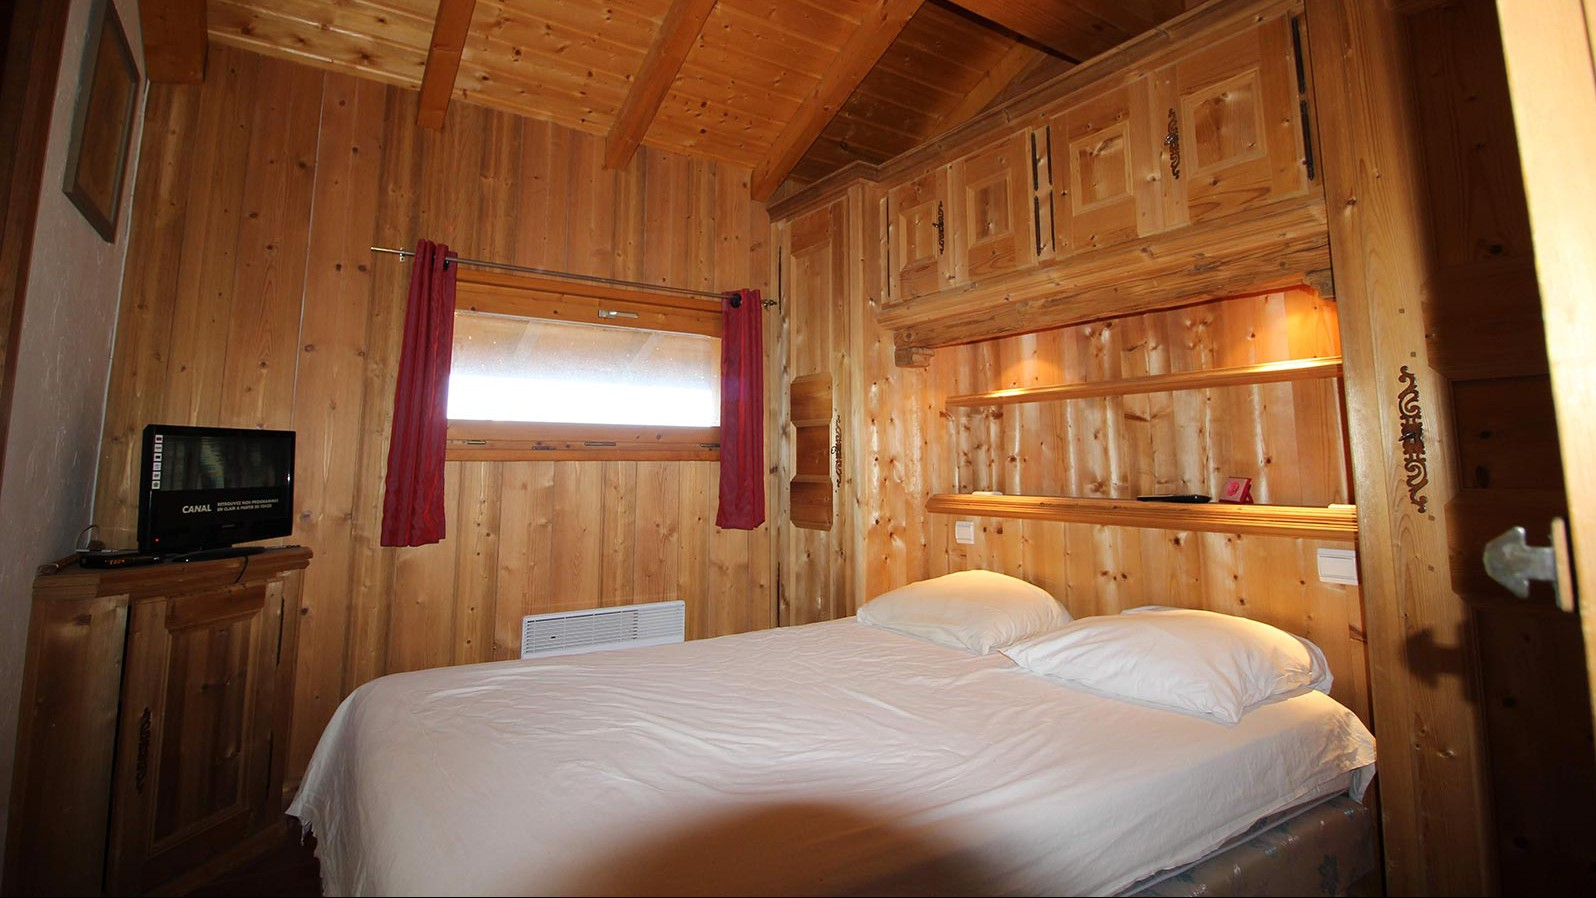 Chalet Simone, Meribel - Lounge - Room